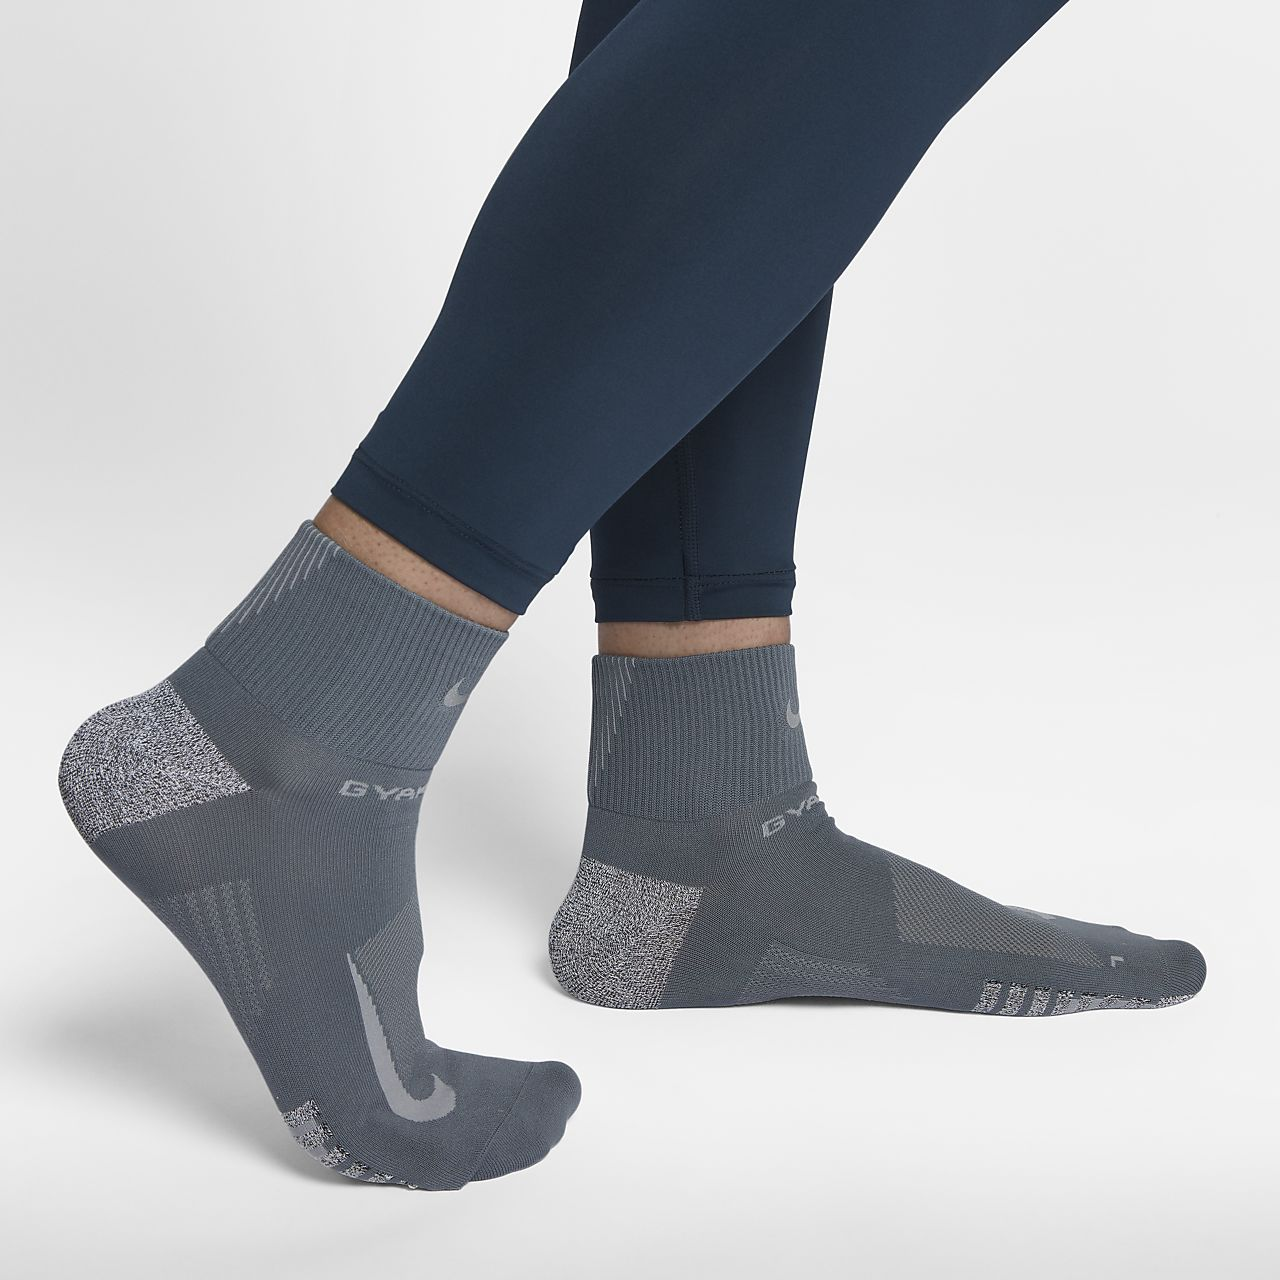 best sneakers 34f0f c8640 ... Nike Gyakusou NikeGrip Unisex Quarter Sock